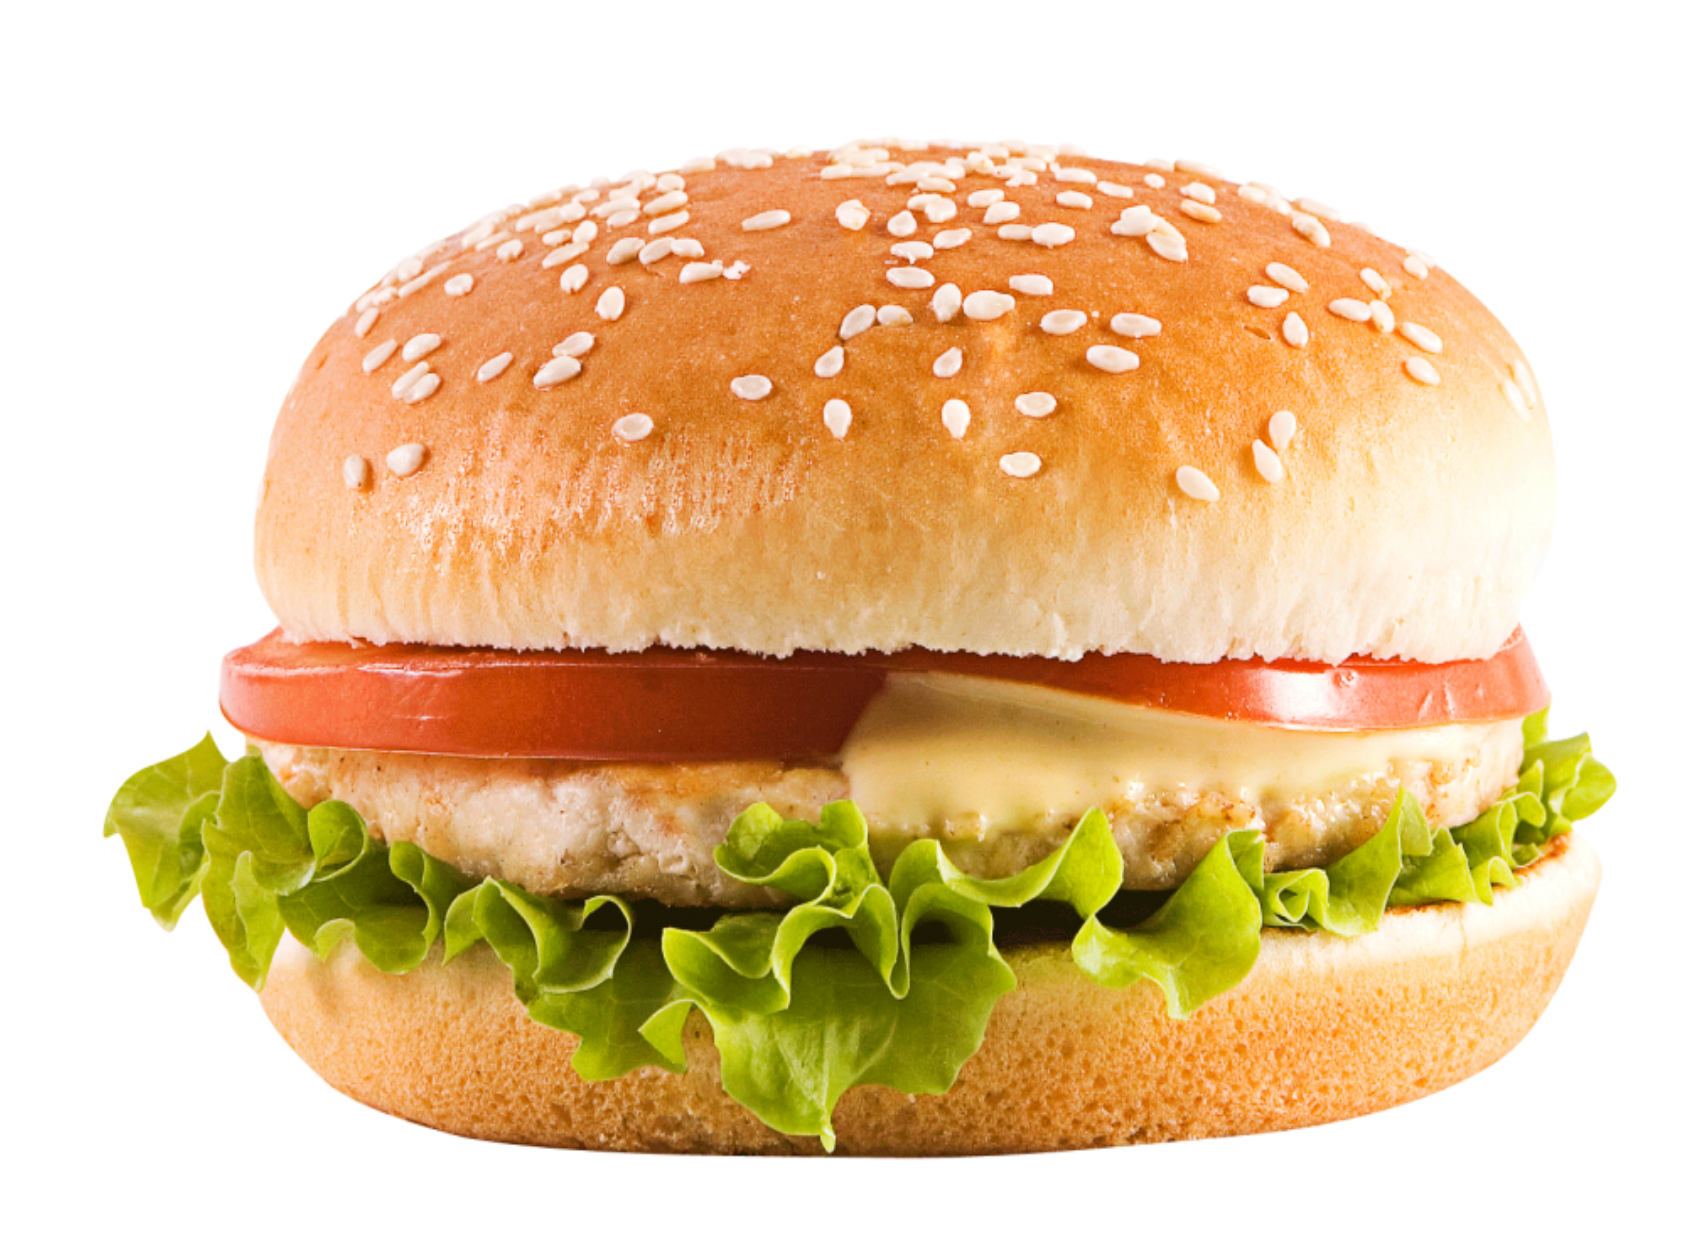 Chicken Cheeseburger PNG Image